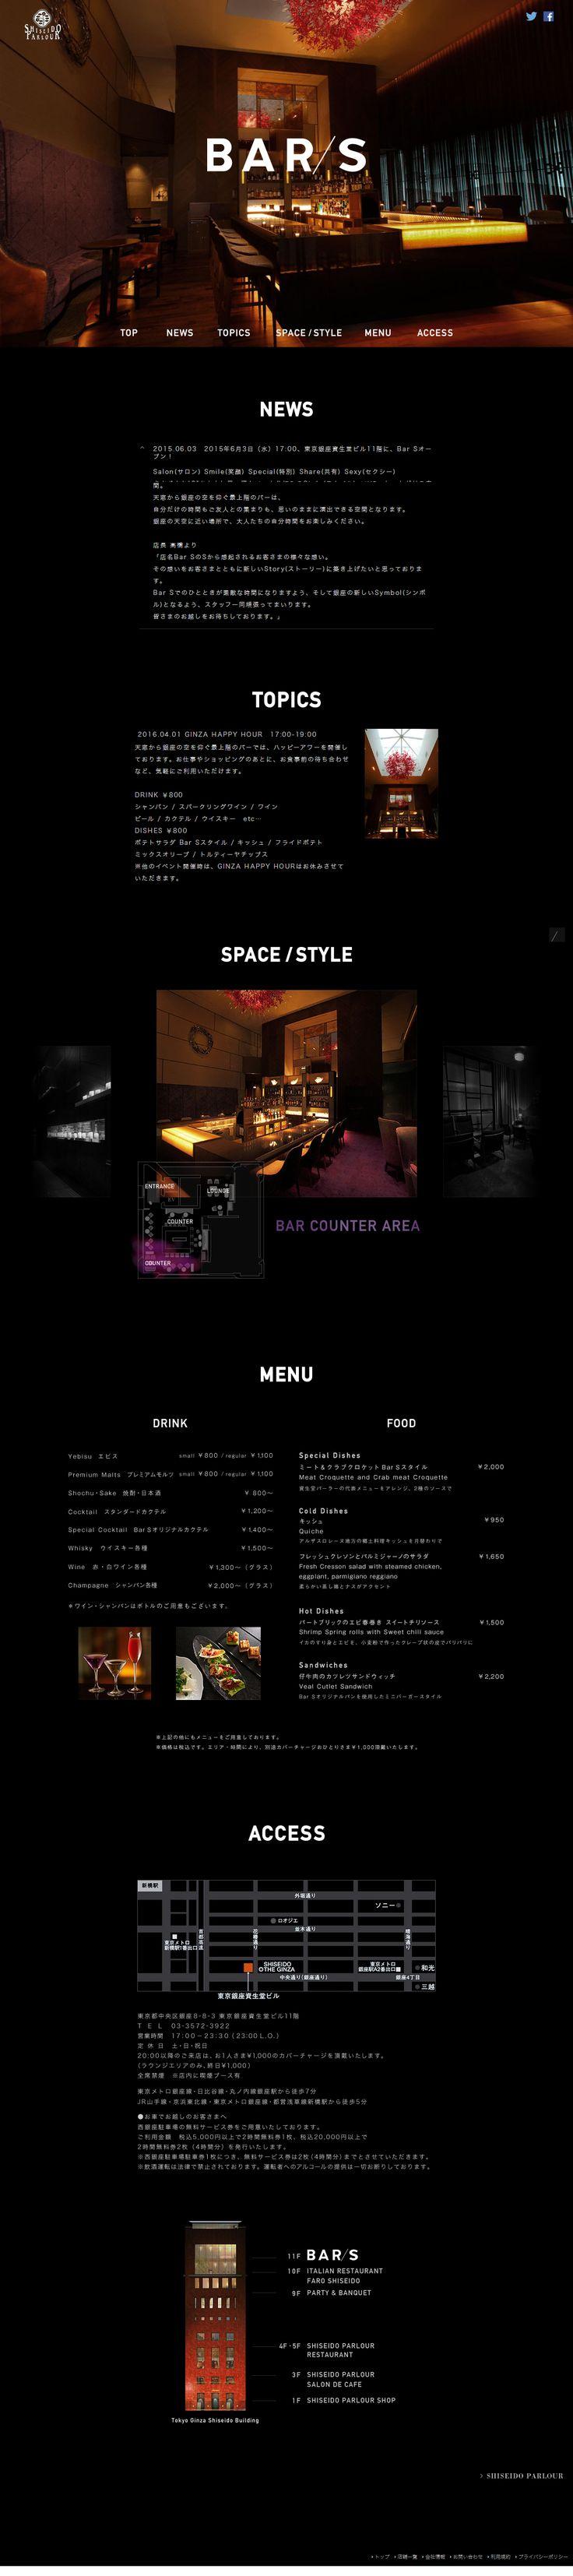 Bar S資生堂パーラー #黒系 #固定ヘッダ #シングルページ http://parlour.shiseido.co.jp/bar/s/